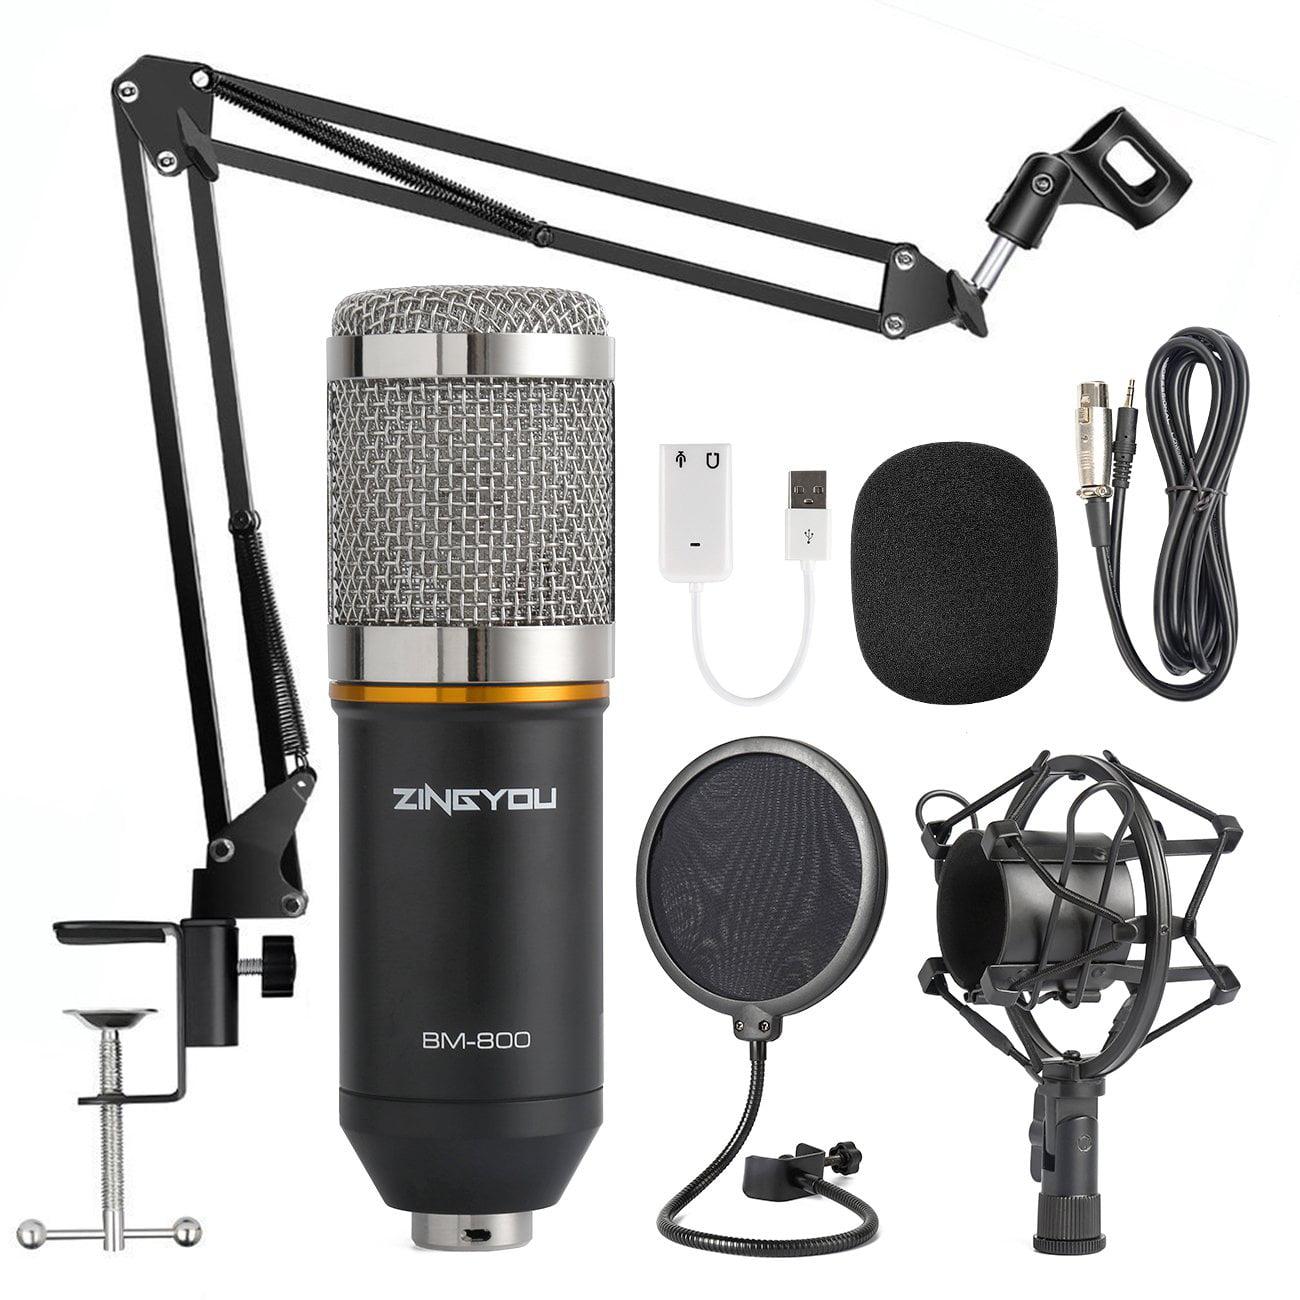 Gohope Condenser Microphone Bundle Bm 800 Mic Kit With Adjustable Mic Suspension Scissor Arm Shock Mount And Double Layer Pop Filter For Studio Recording Brocasting Bm 800 Microphone Bundle Walmart Canada